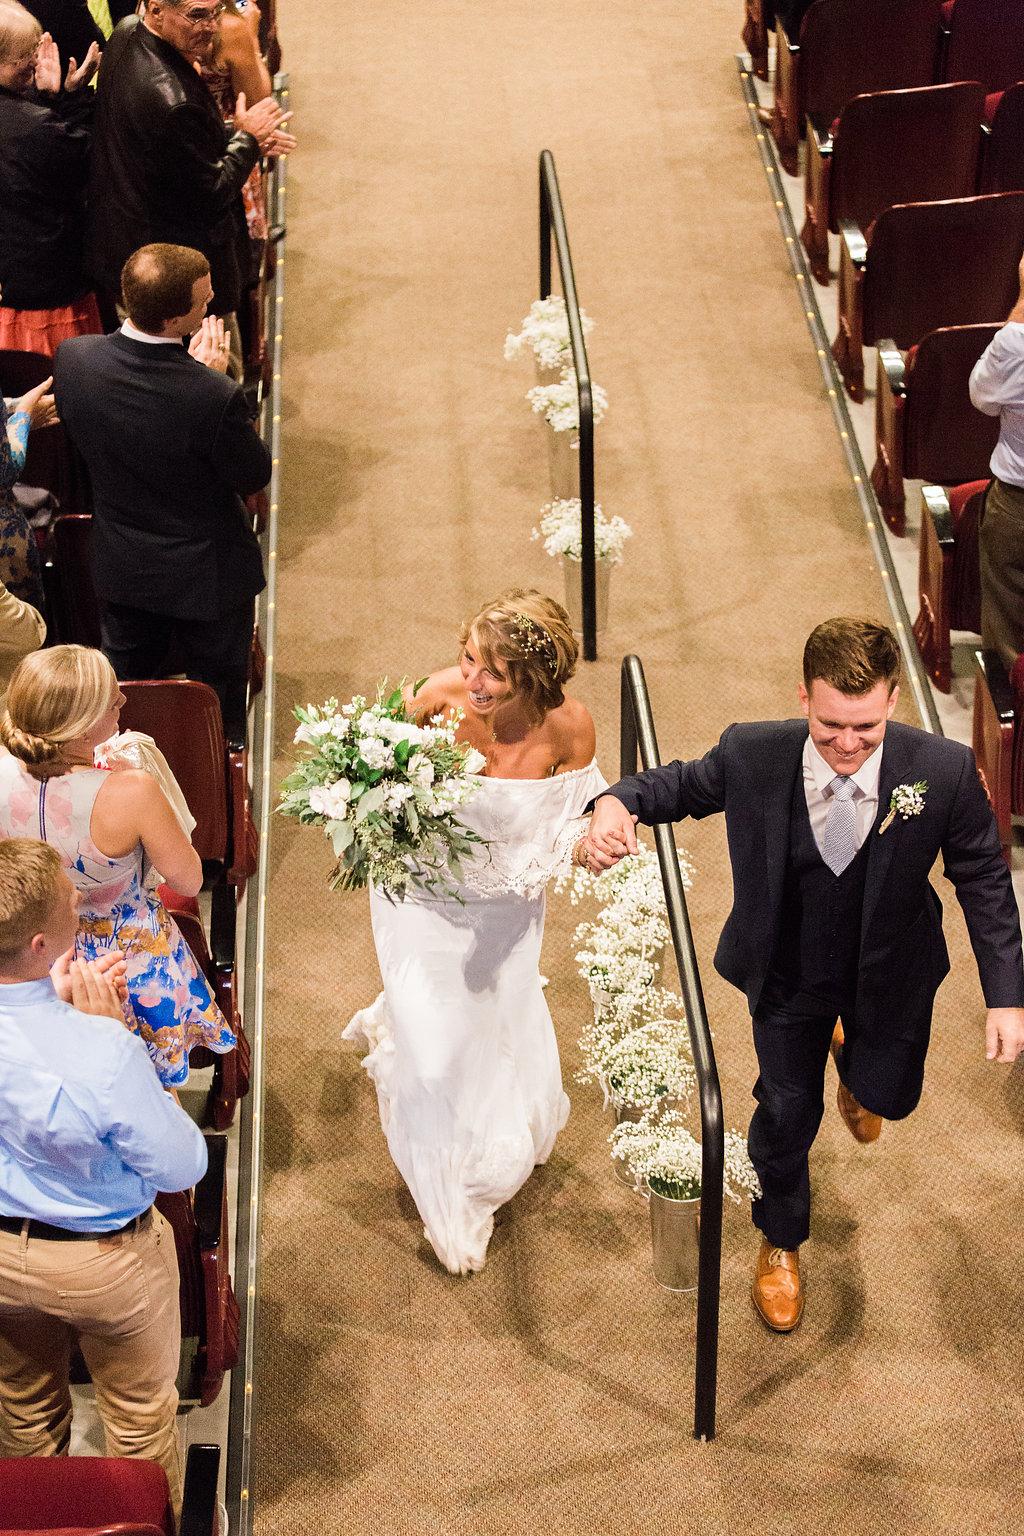 stacey-and-tj-wedding-apartment-b-photography-ivory-and-beau-bridal-boutique-savannah-wedding-dresses-daughters-of-simone-lu-boho-bride-boho-wedding-savannah-boho-wedding-savannah-weddings-savannah-bridal-gowns-savannah-wedding-40.jpg